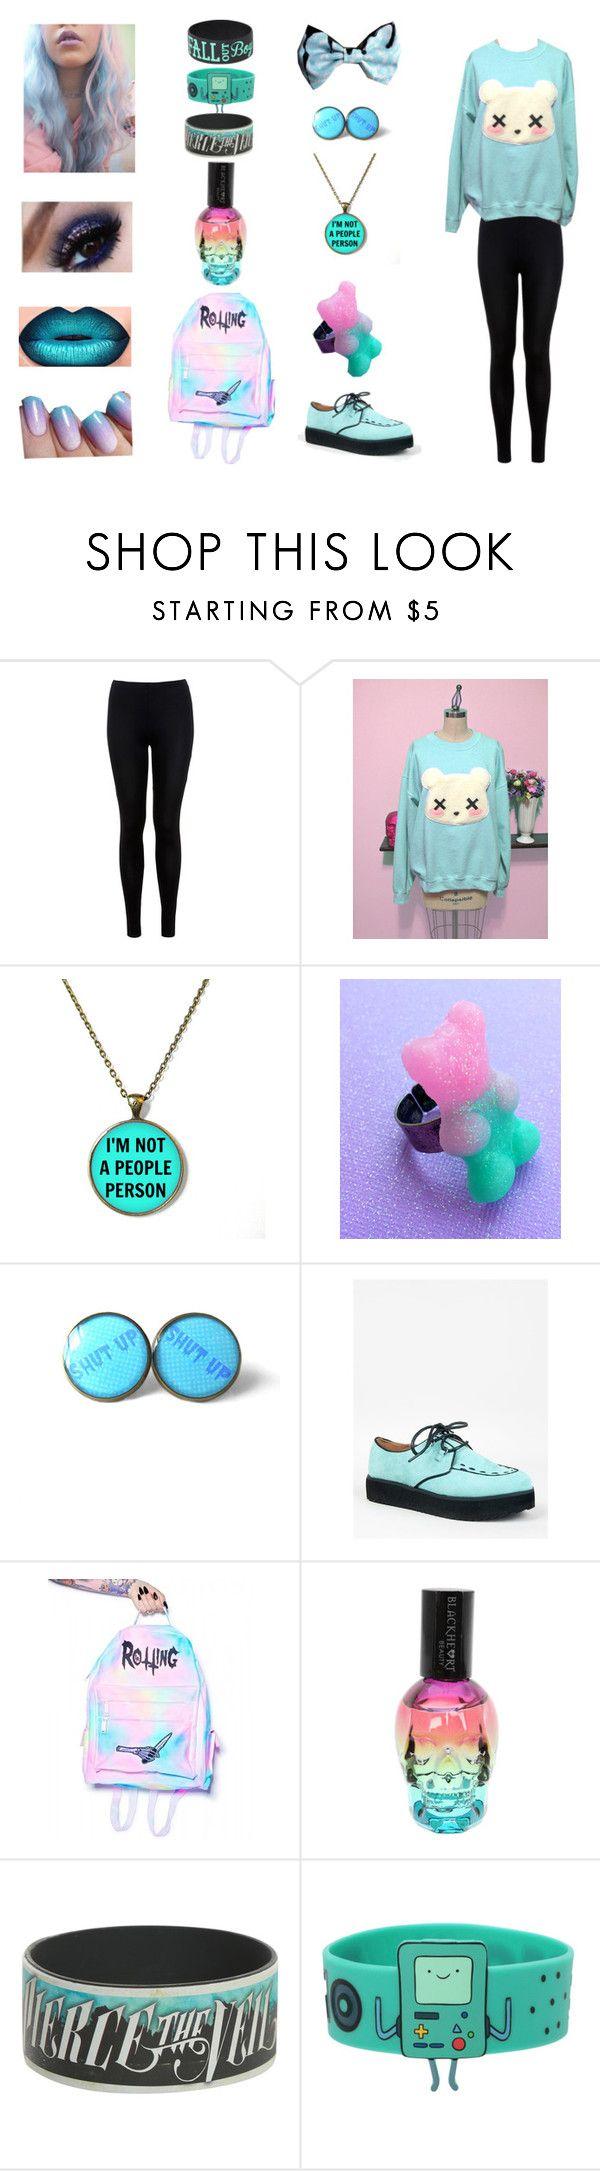 """Pastel Goth Outfit 2"" by bringmetheblackveilsirens ❤ liked on Polyvore featuring moda, Miss Selfridge, Qupid, Rotting Fresh, goth, pastel, pastelgoth, piercetheveil y falloutboy"